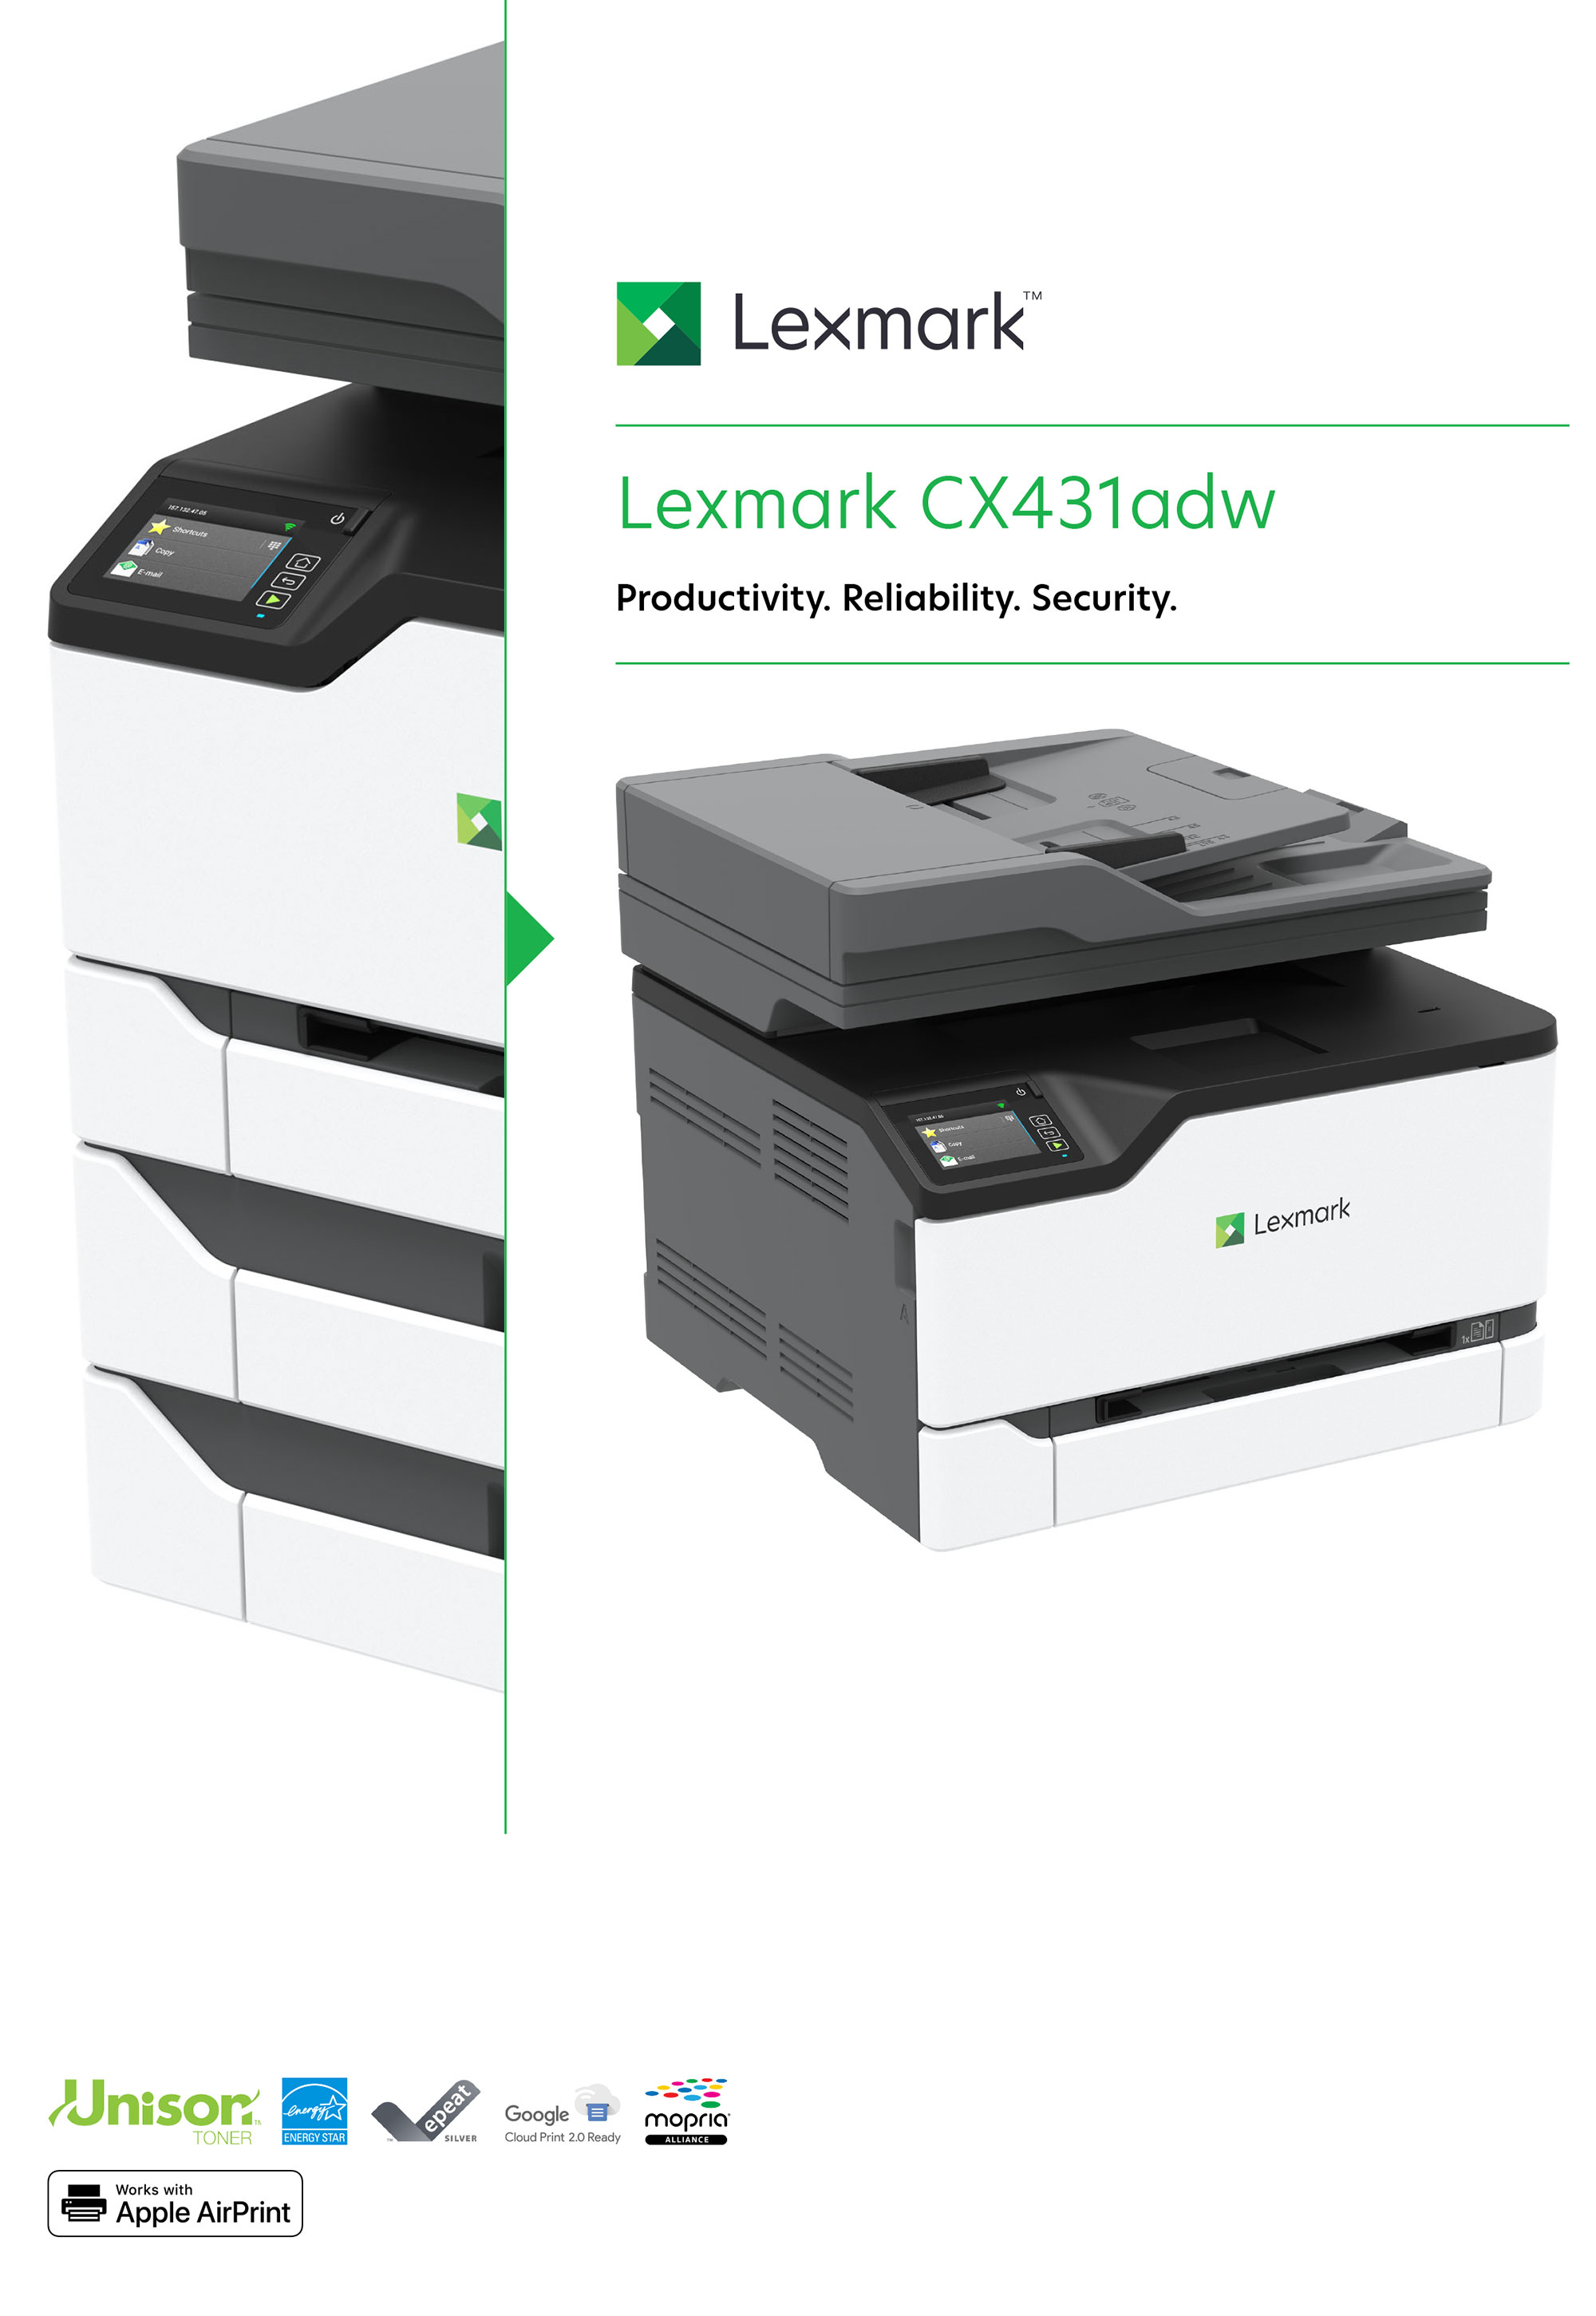 Lexmark CX431adw